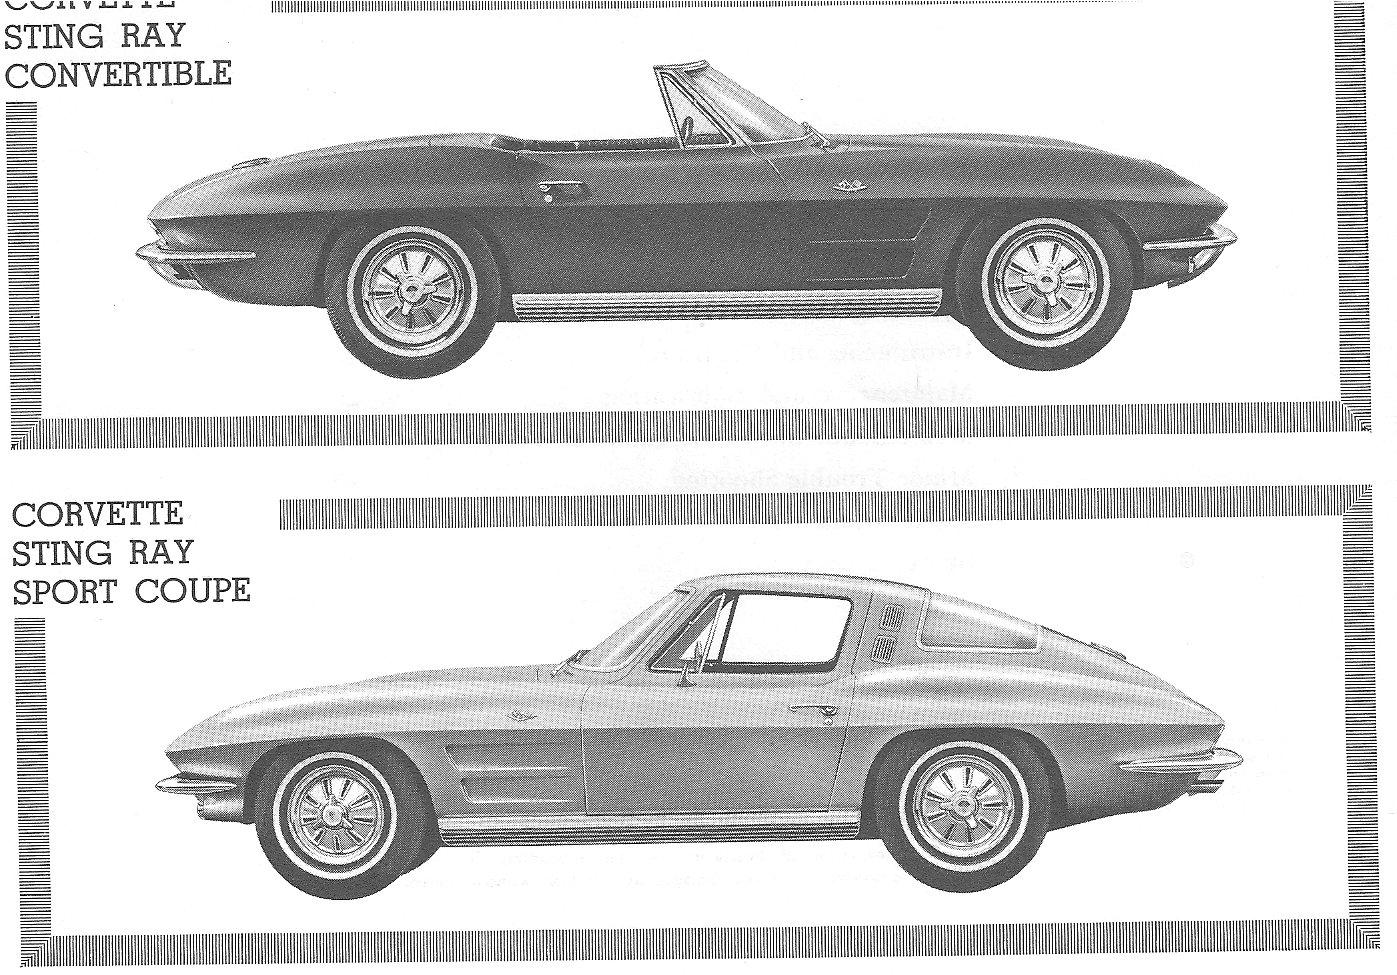 directory index chevrolet corvette 1964 chevrolet corvette rh oldcarbrochures com 03 Corvette Convertible 03 Corvette Z06